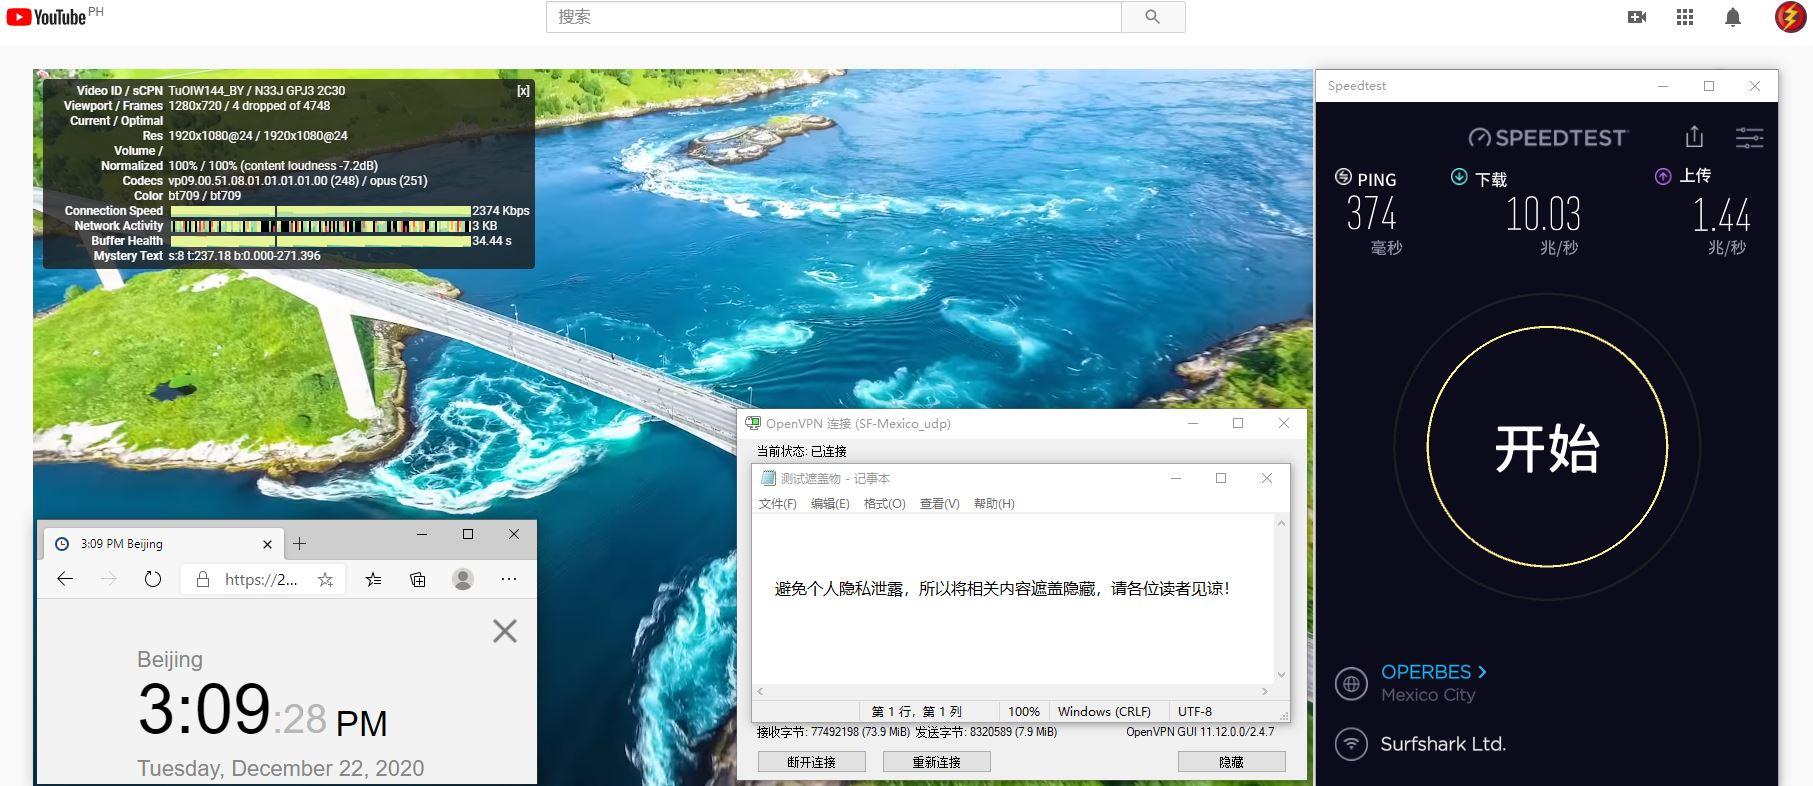 Windows10 SurfsharkVPN Mexico-2 服务器 中国VPN 翻墙 科学上网 测试 - 20201222